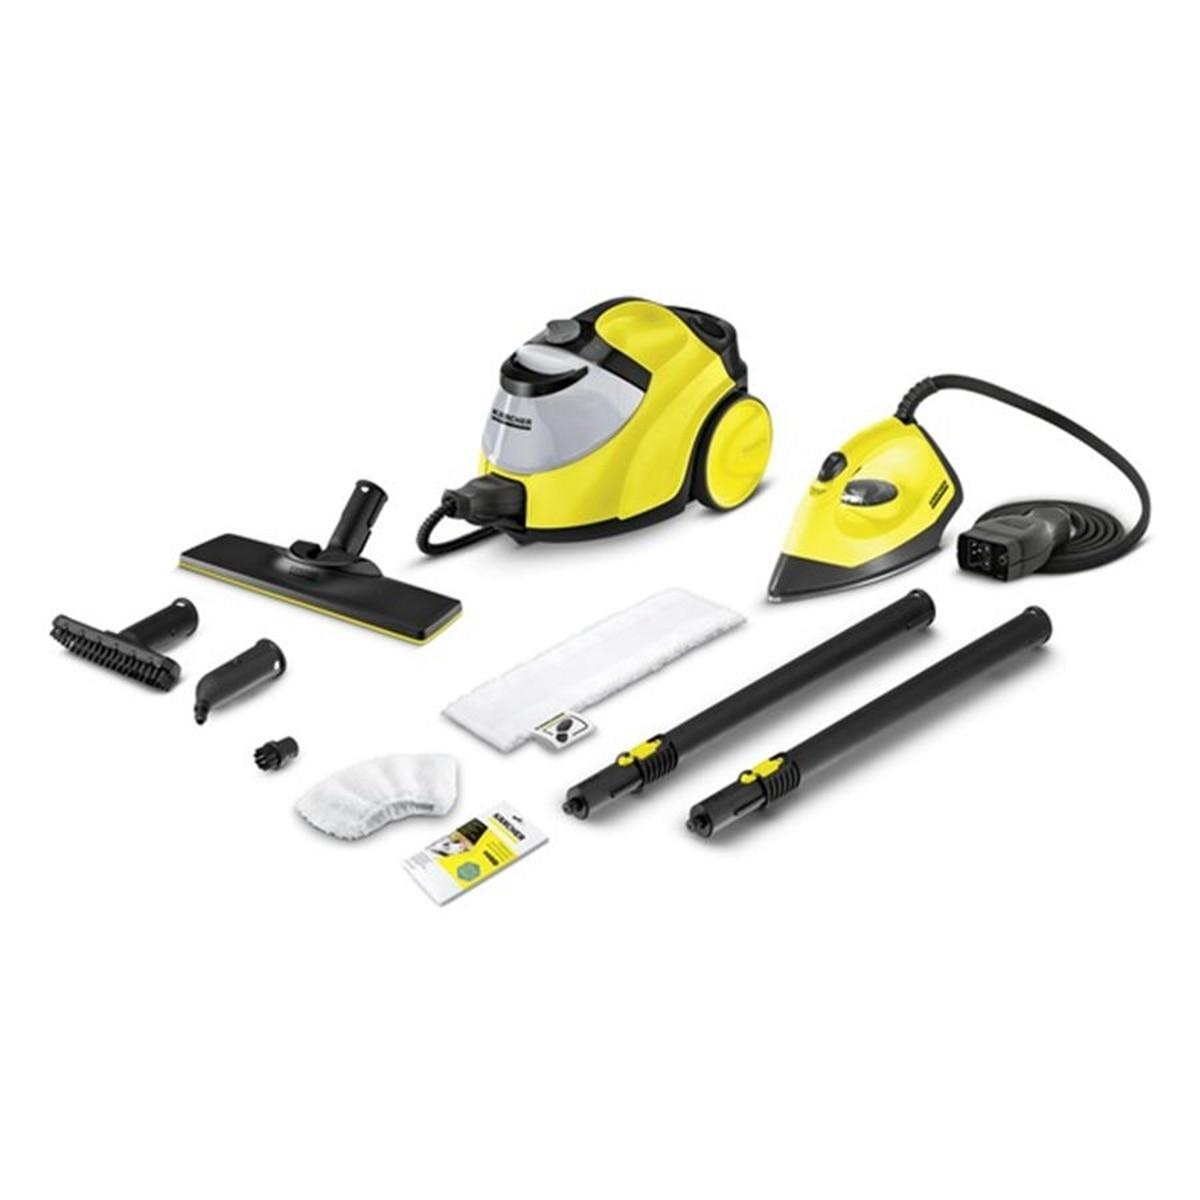 цена на Steam cleaner Karcher SC 5 Iron Kit EasyFix